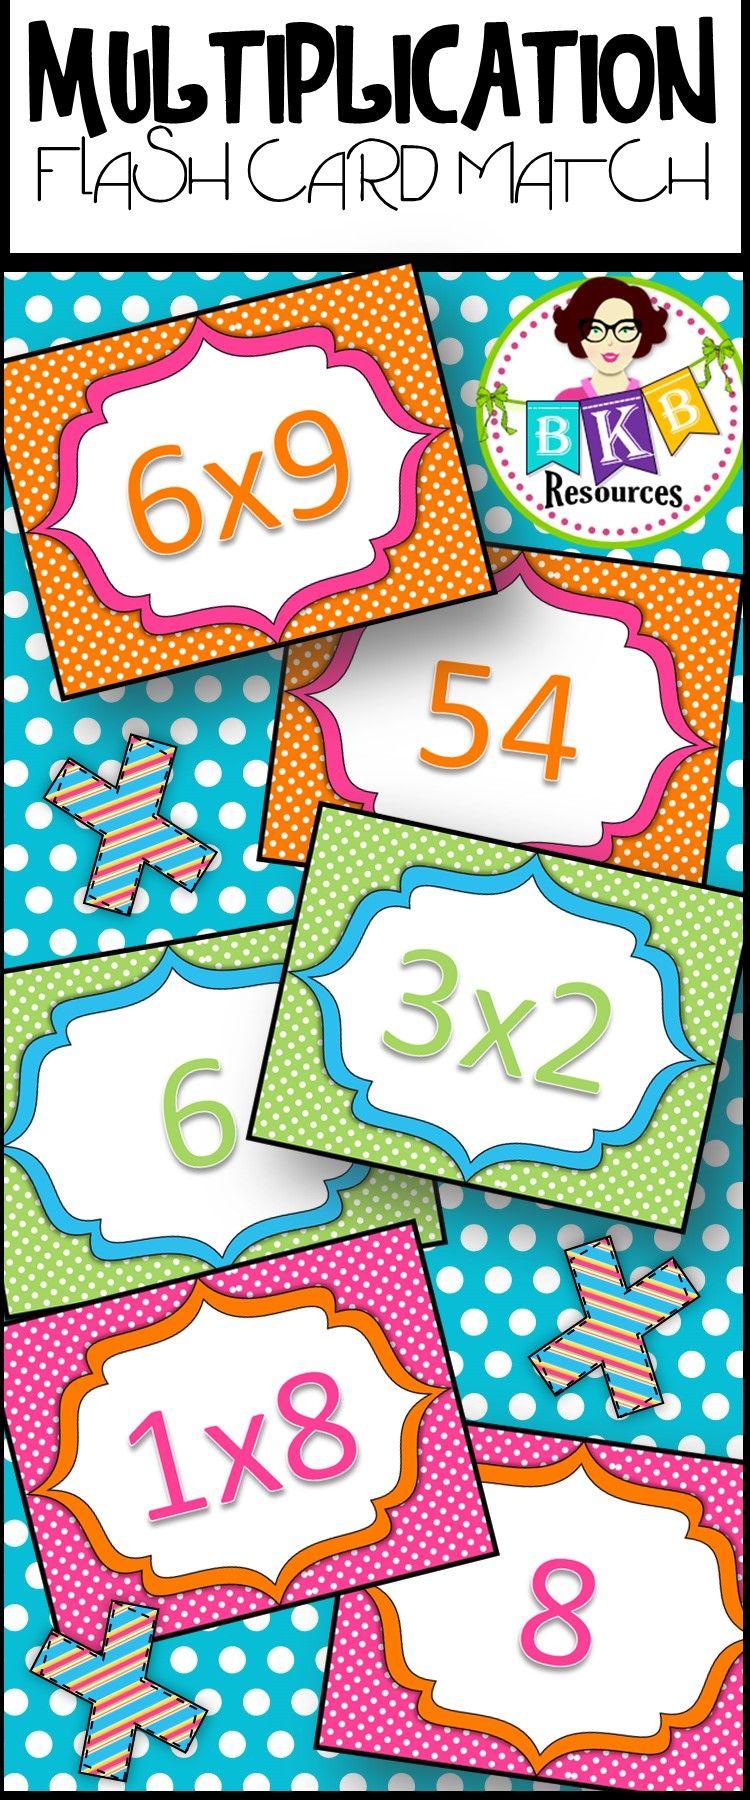 Multiplication Flash Card Match. Printable Multiplication